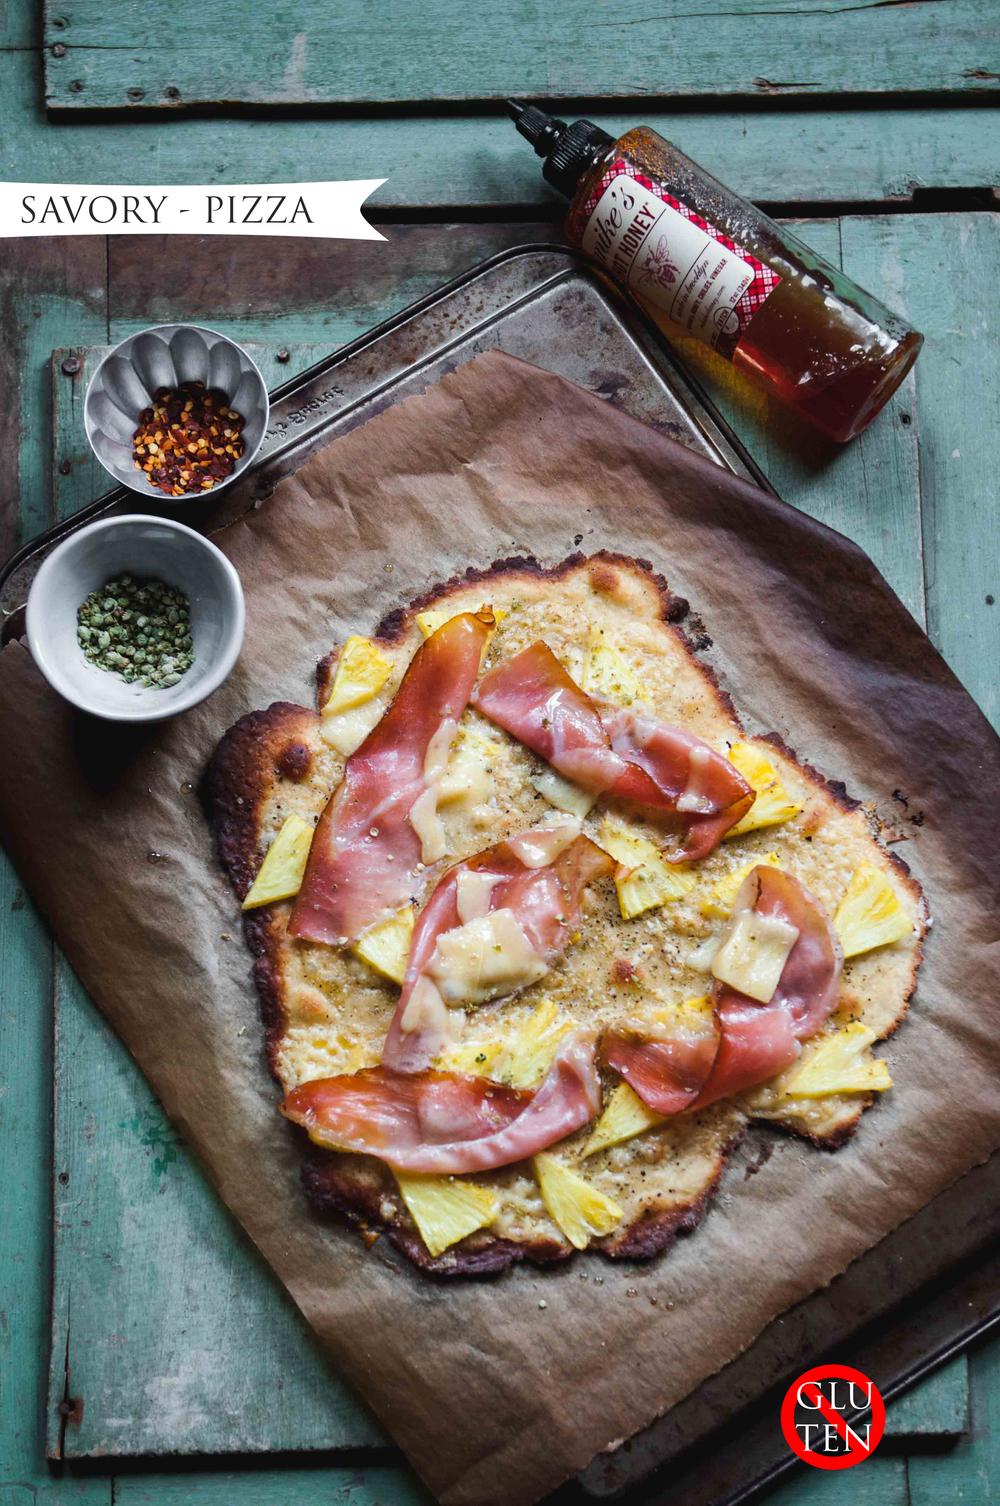 GLUTEN FREE PIZZA, HAM + PINEAPPLE